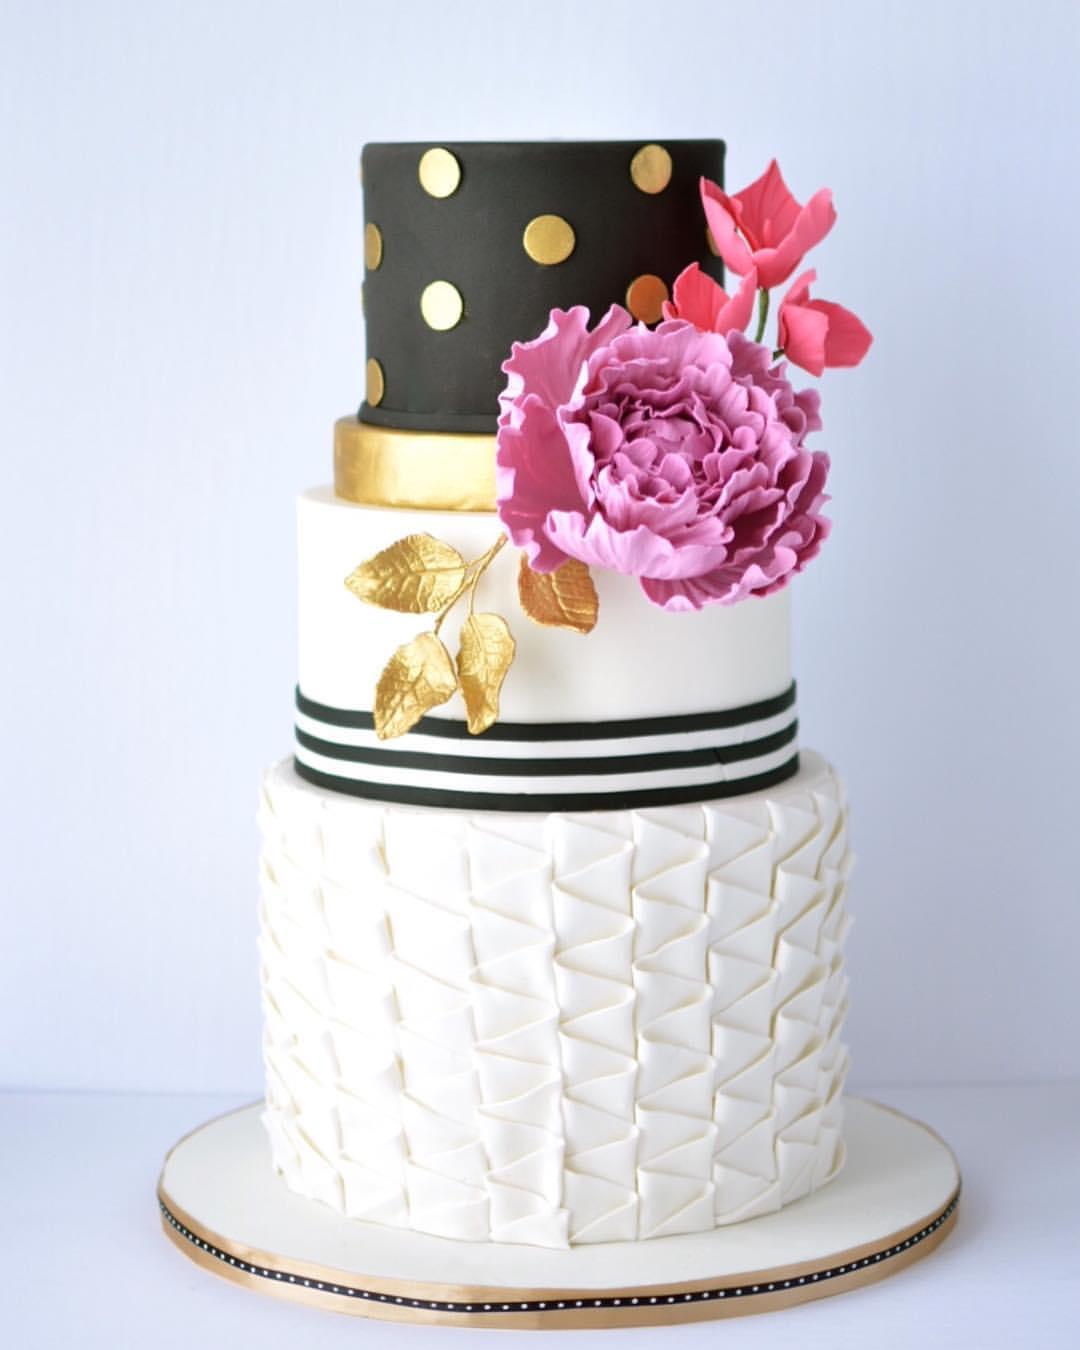 Black with gold polka dot patterned wedding cake